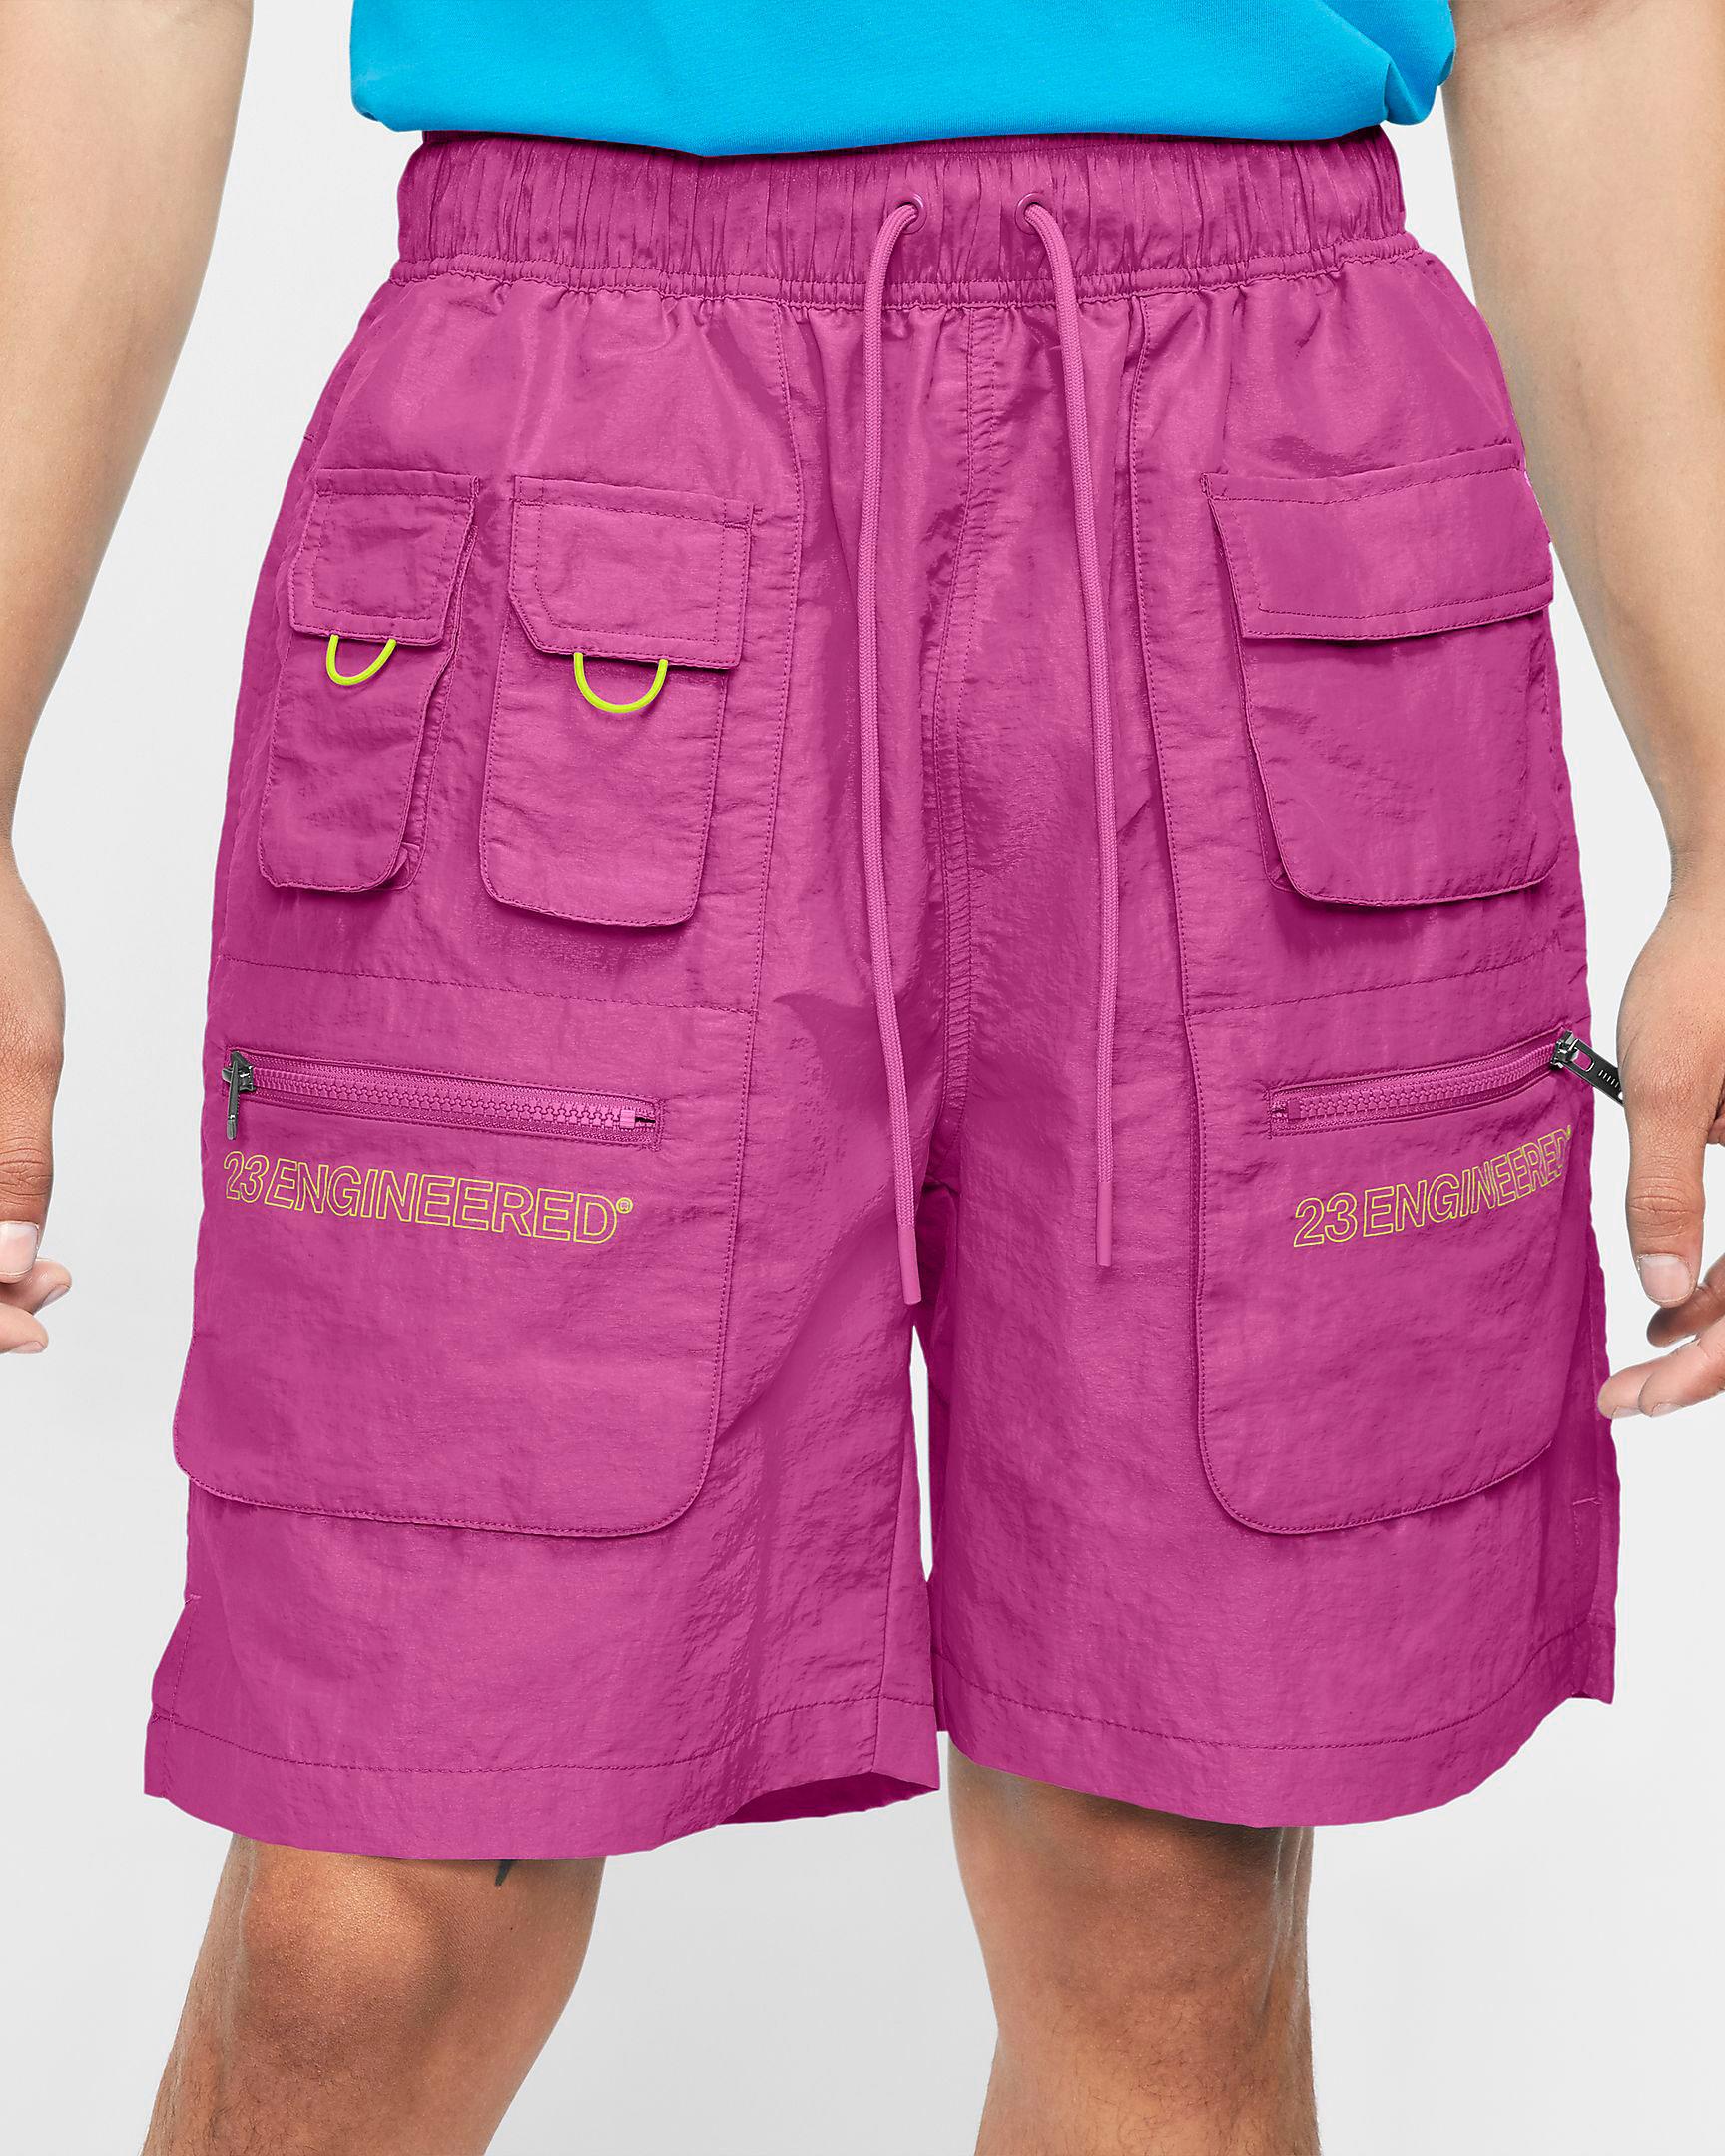 jordan-23-engineered-fuchsia-shorts-1